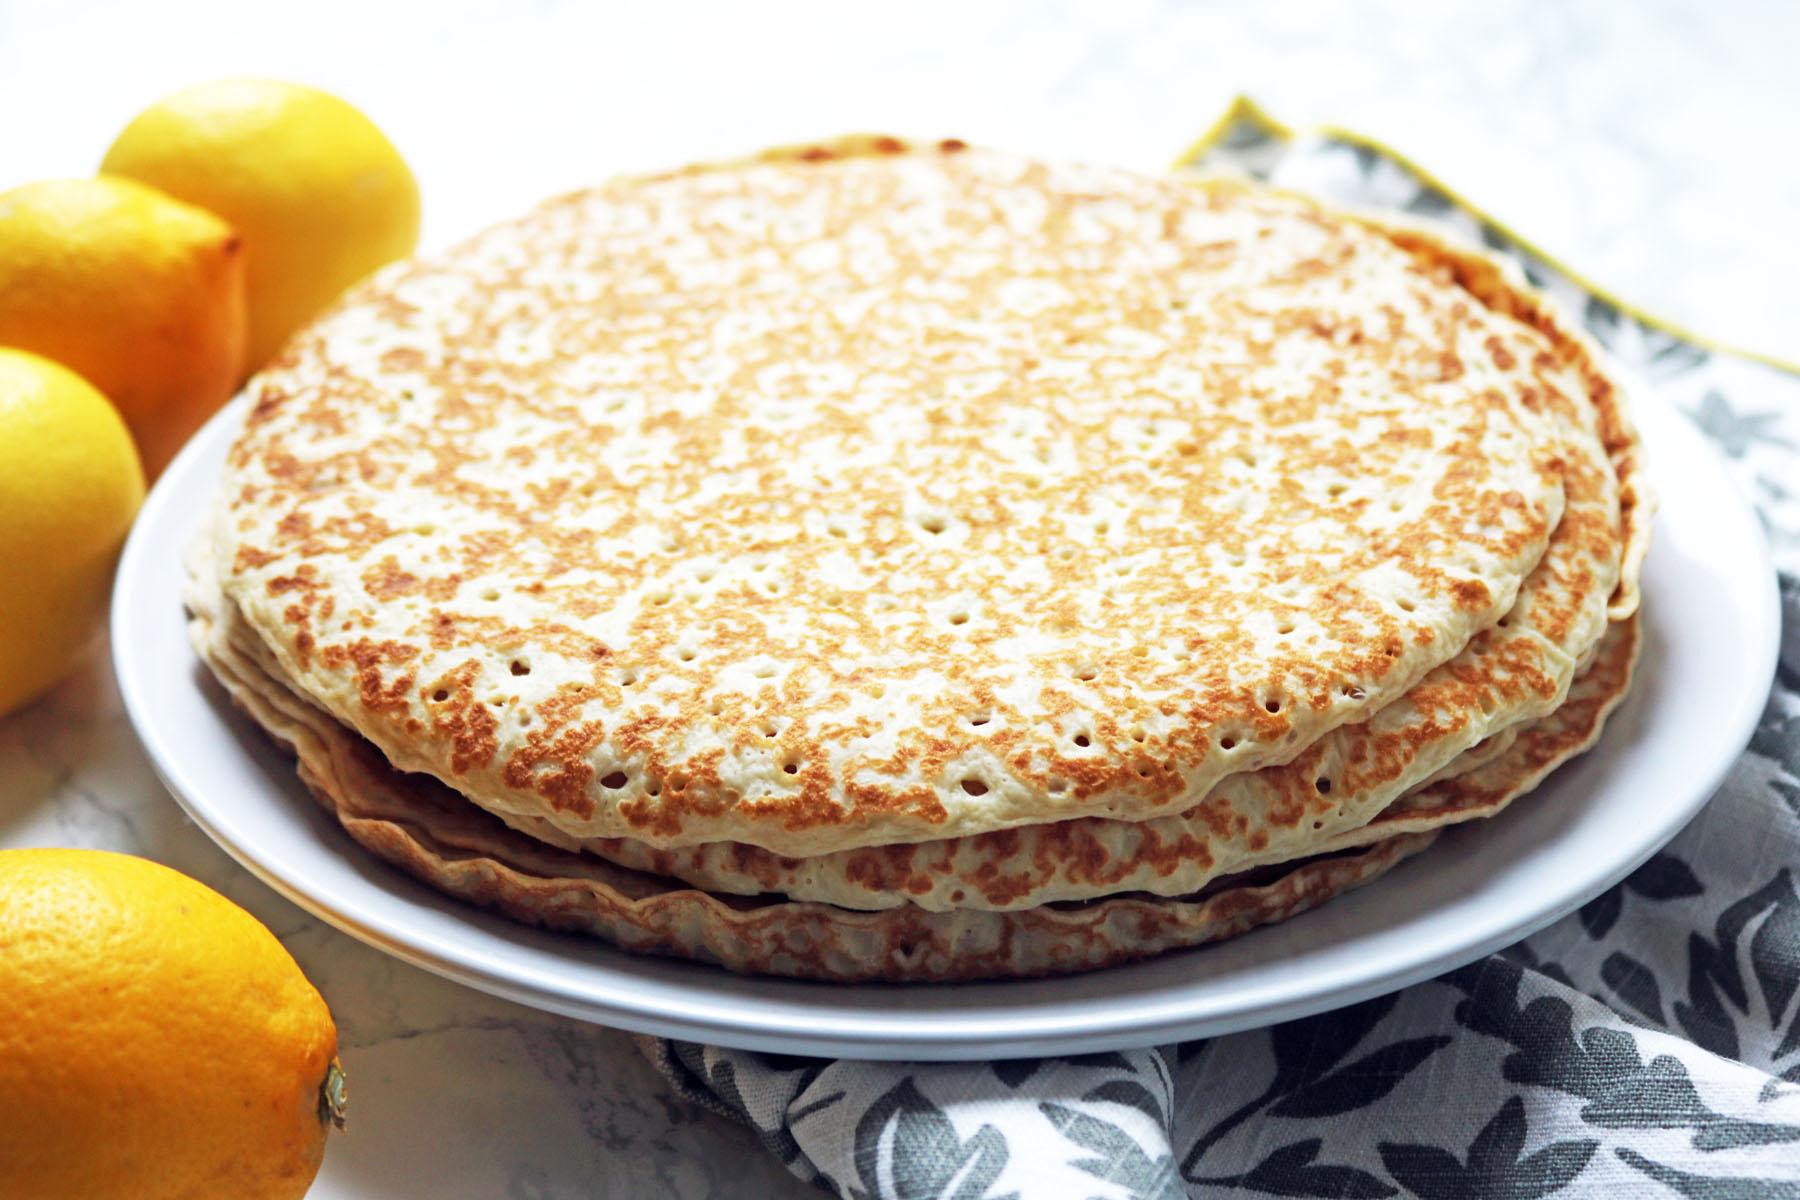 How to make perfect pancakes